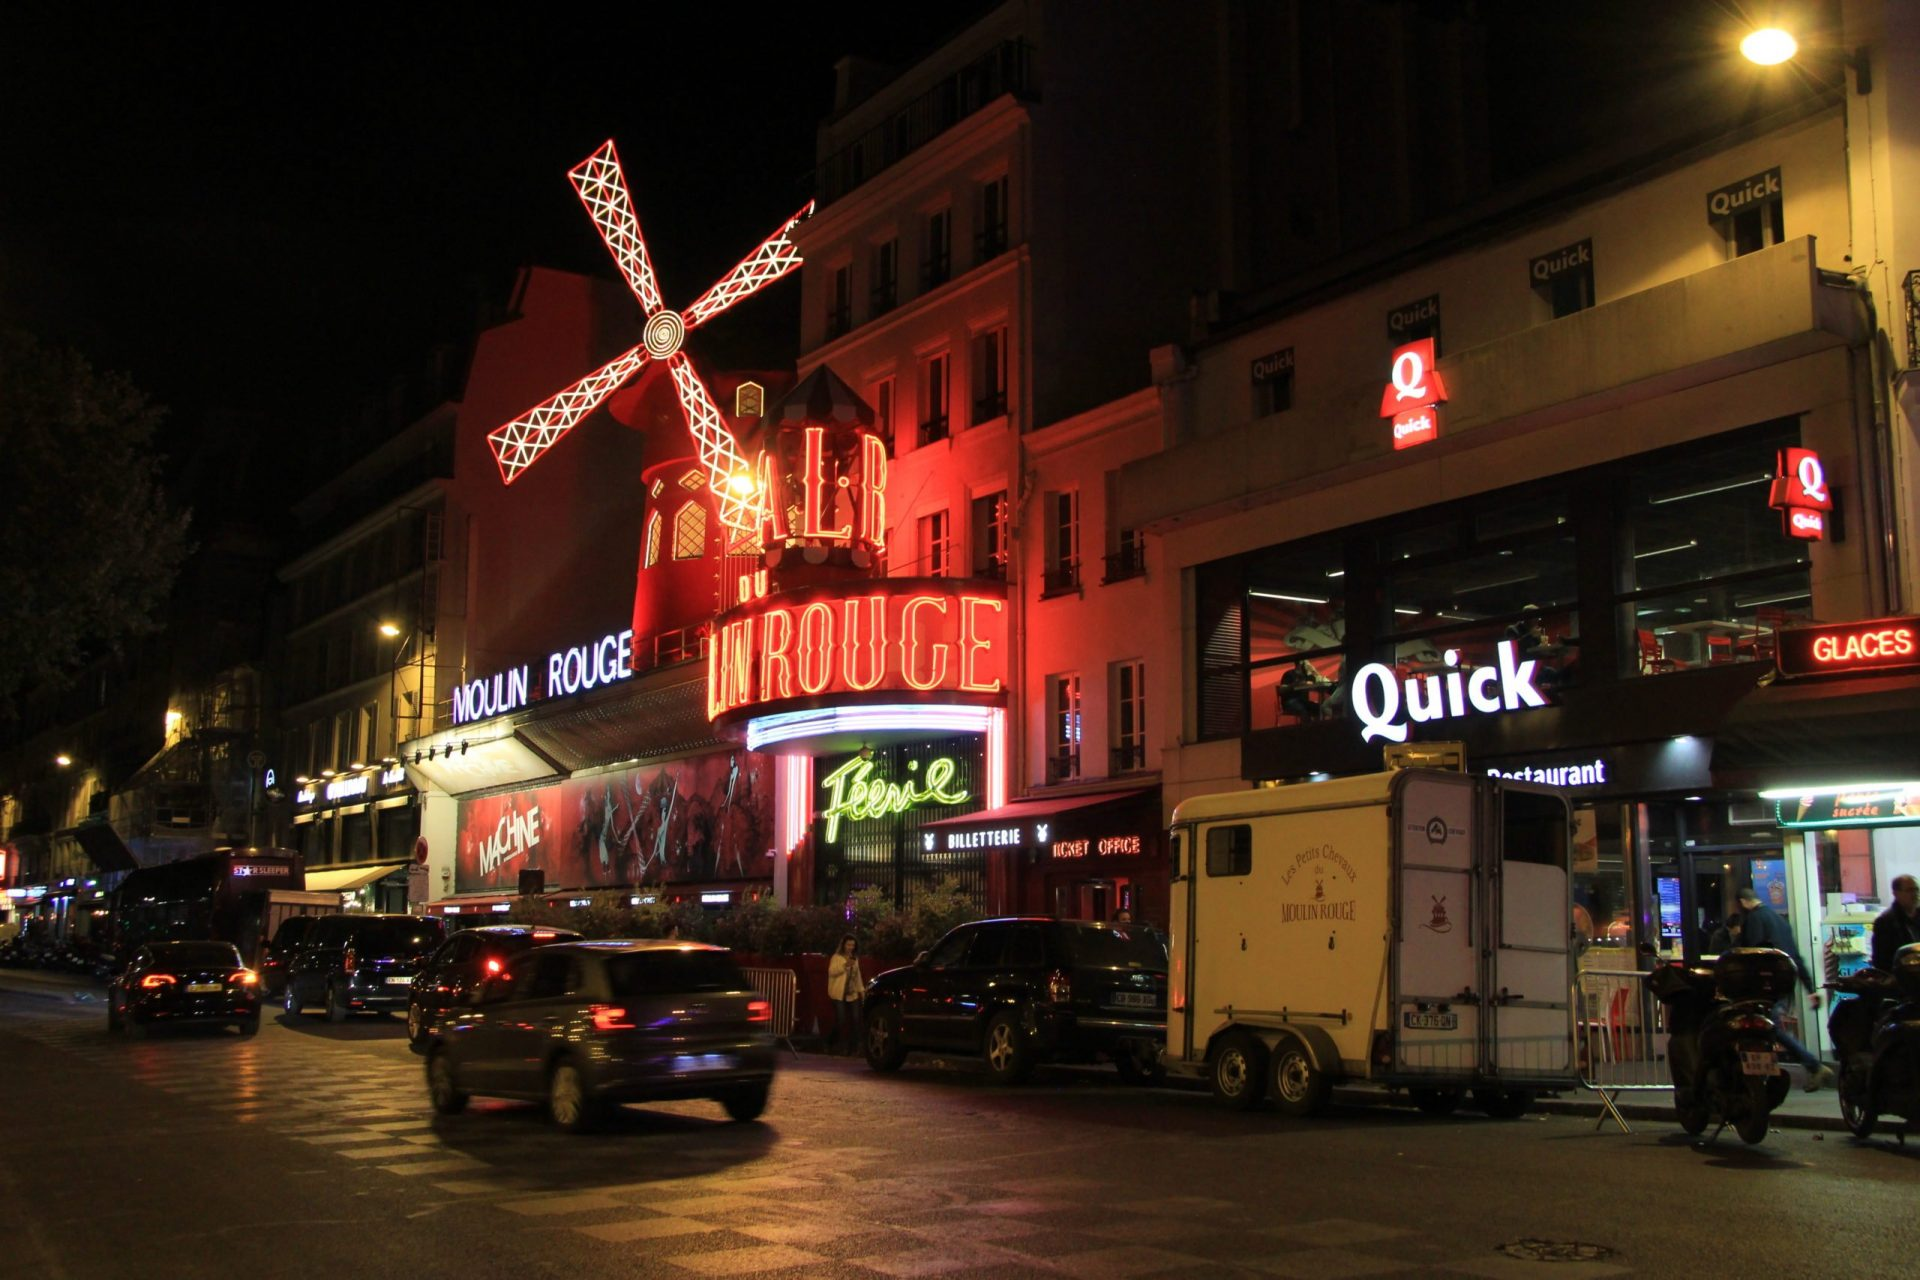 Мулен Руж, Париж, Франция. Сентябрь, 2019